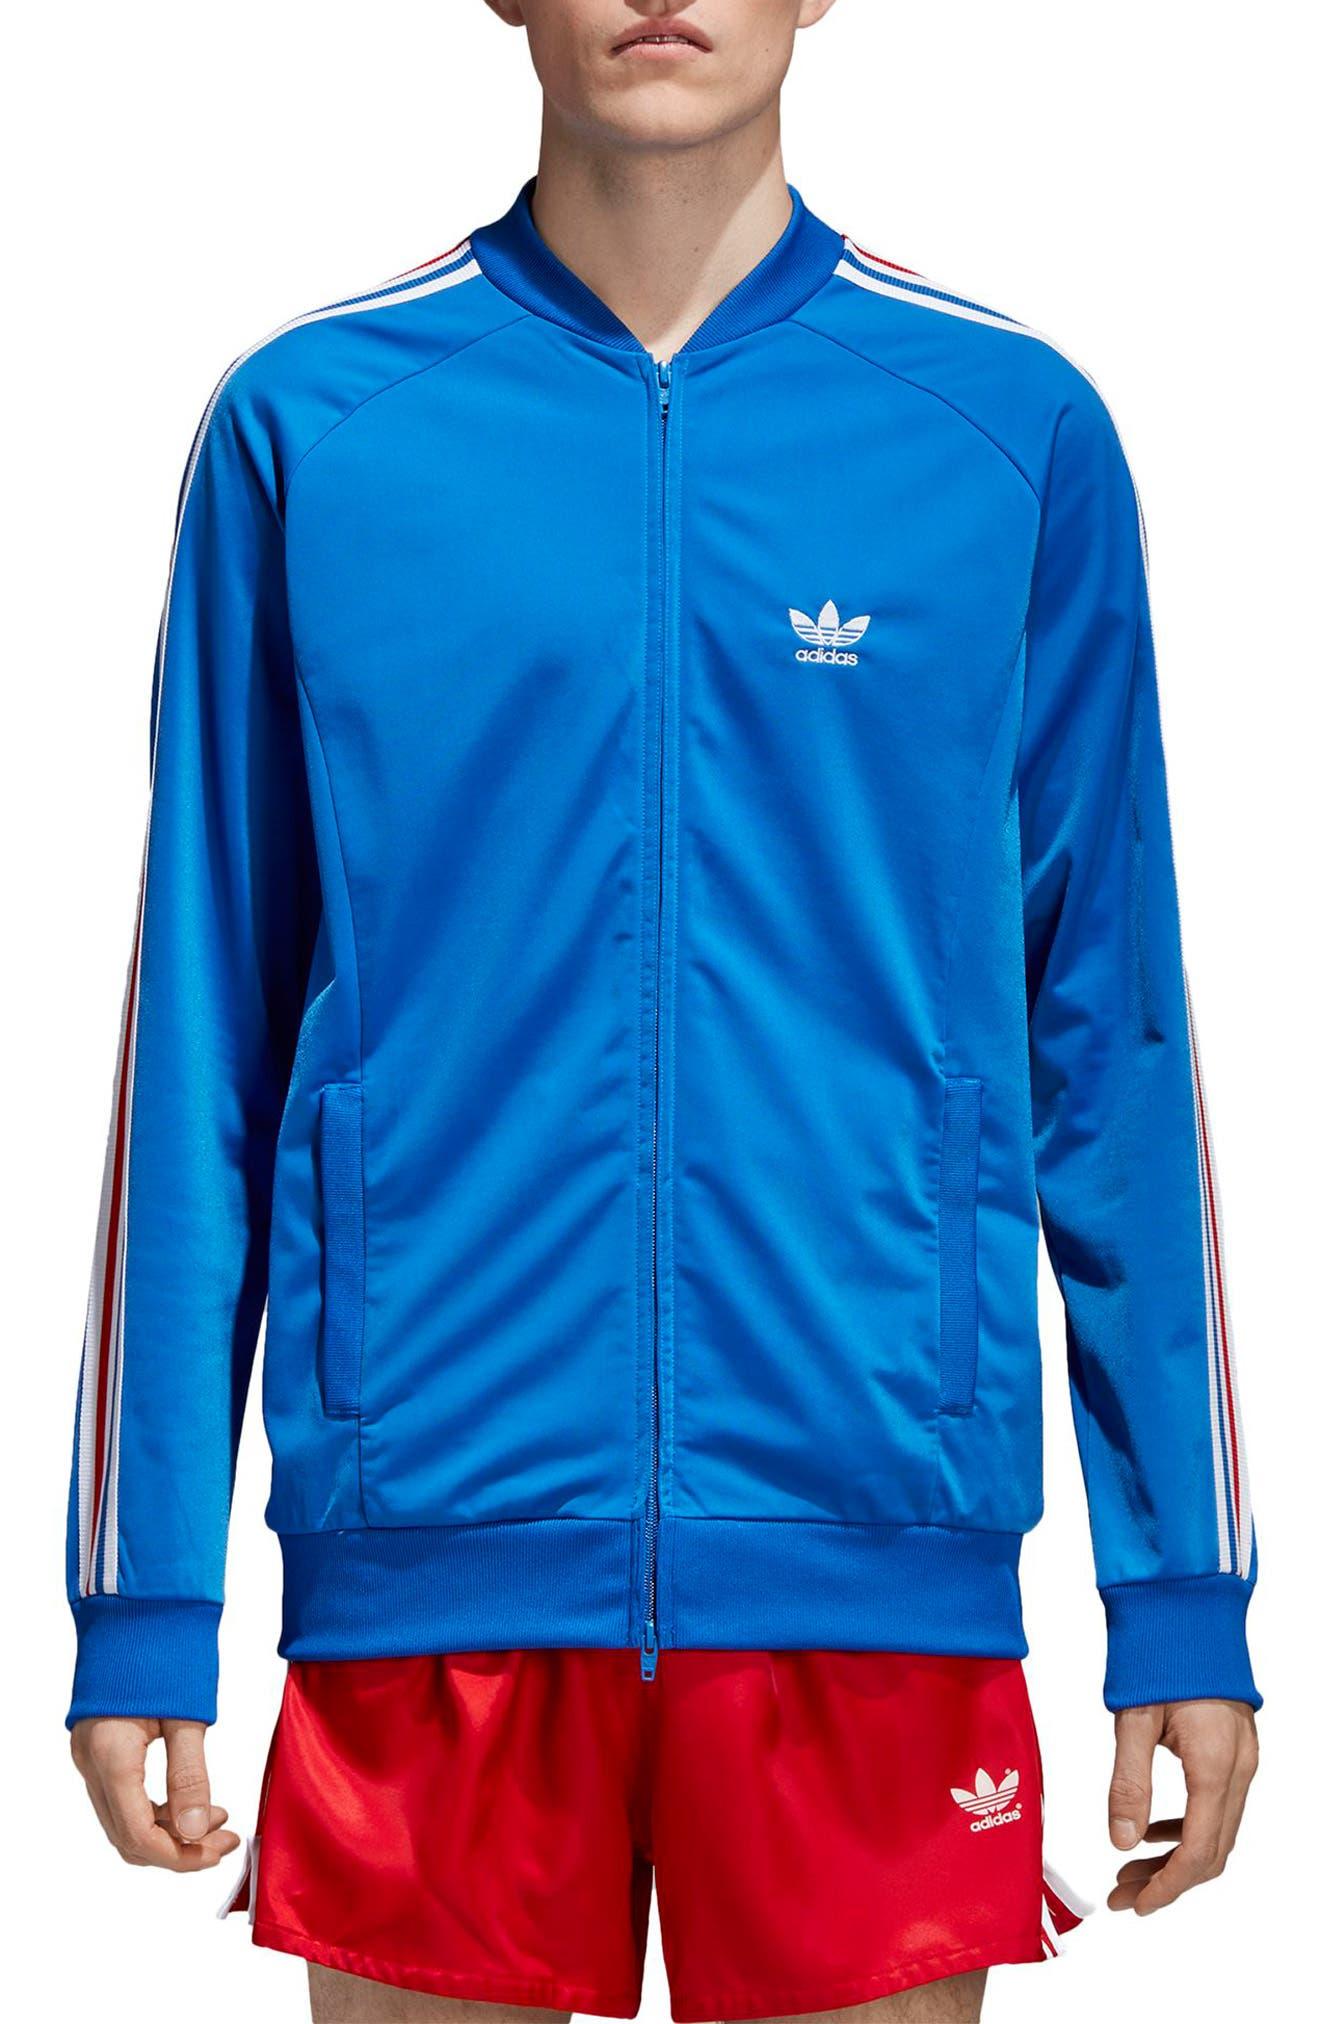 SST Track Jacket,                             Main thumbnail 1, color,                             Blue